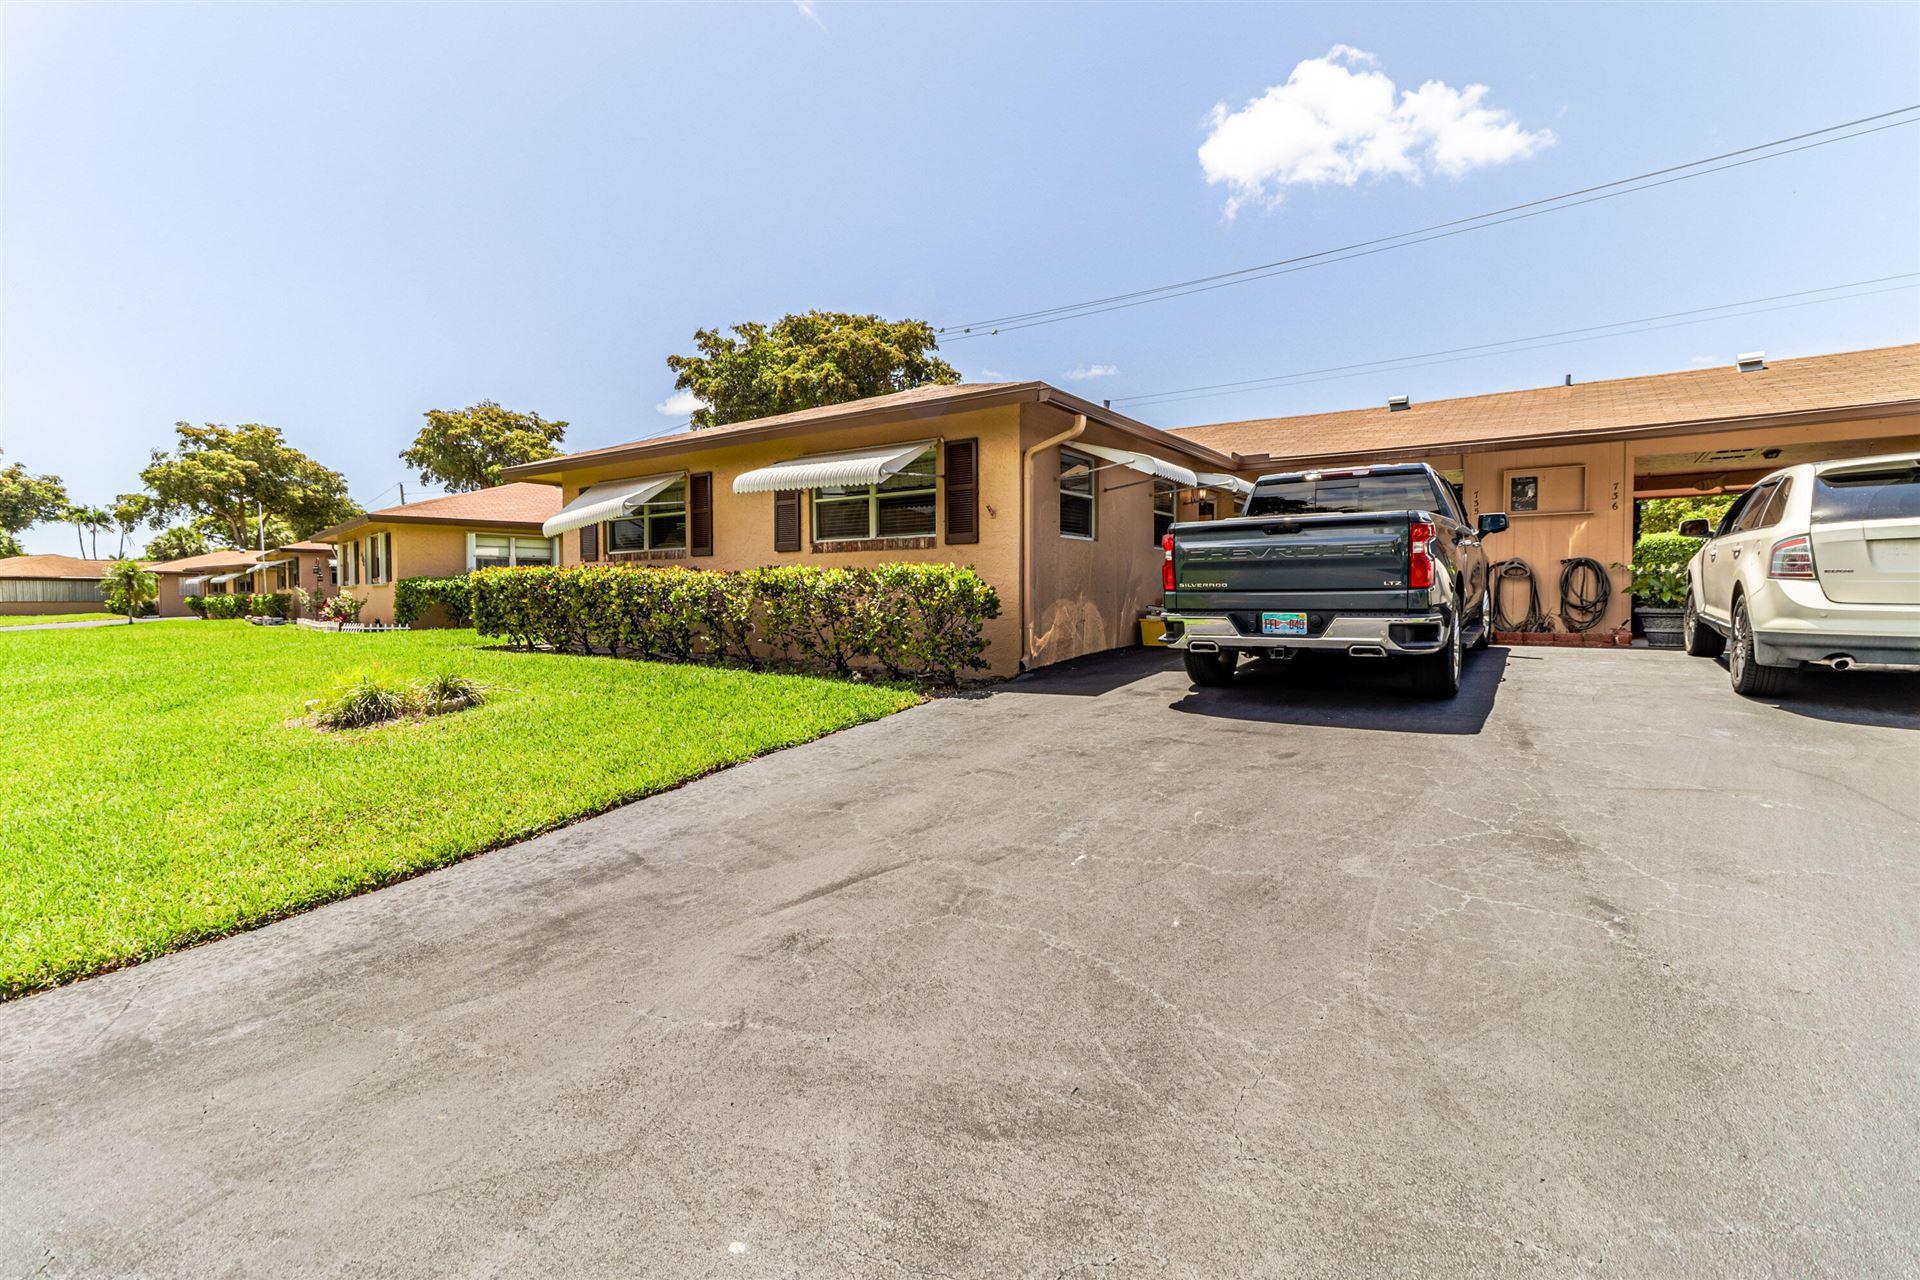 735 Whippoorwill Lane, Delray Beach, FL 33445 - MLS#: RX-10717541